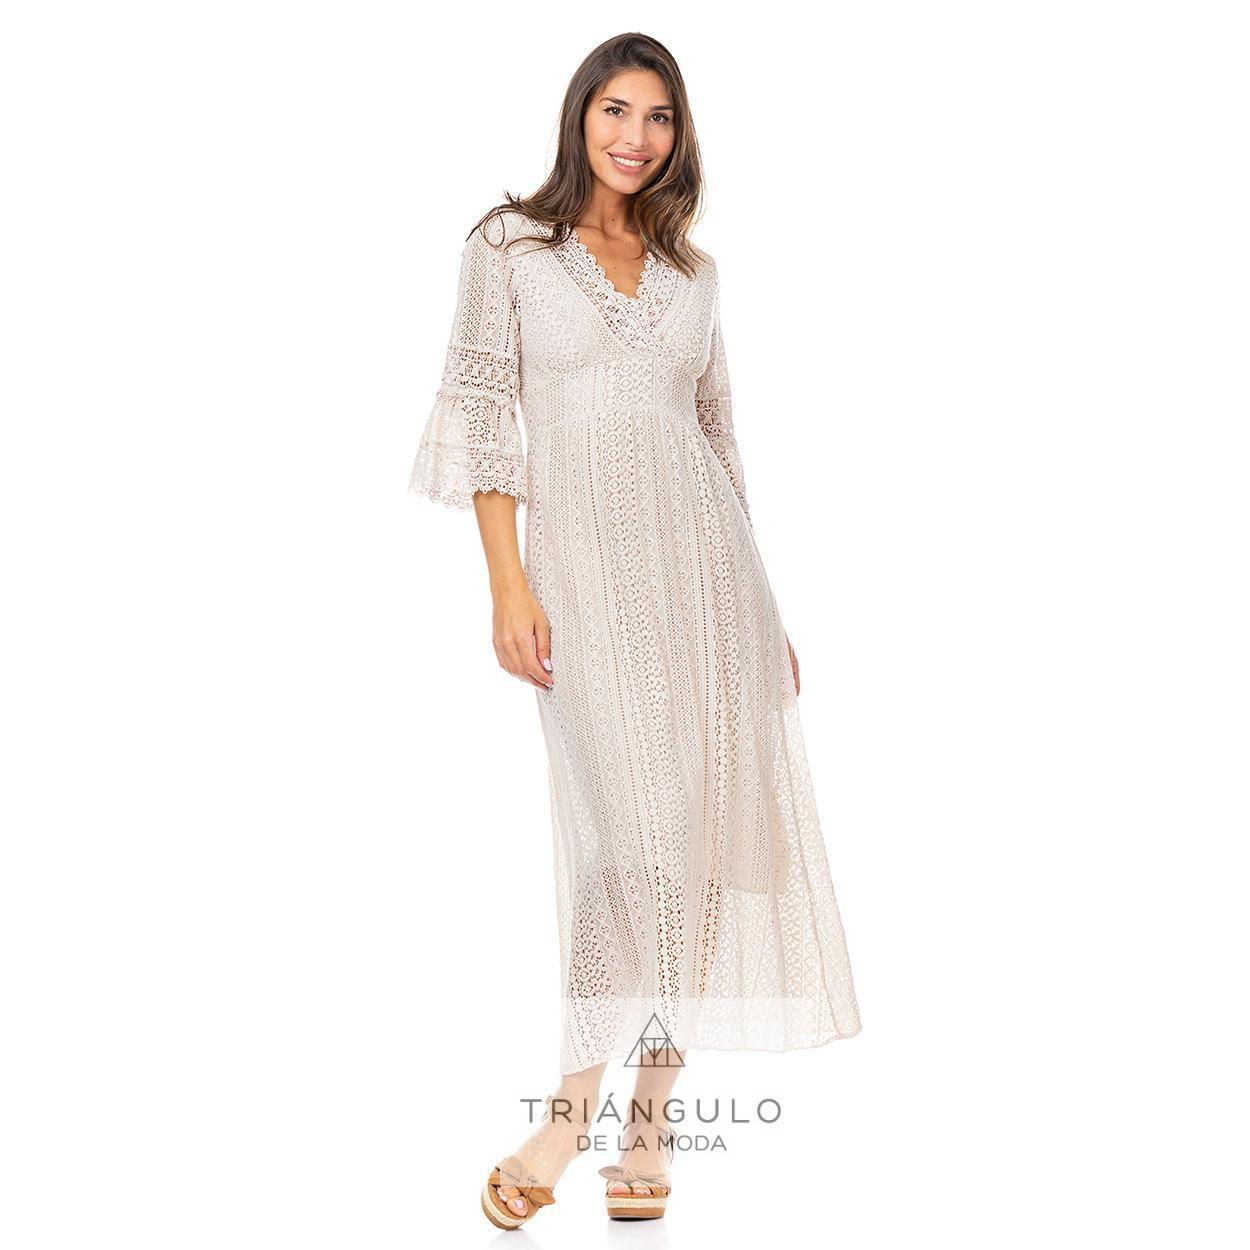 Tienda online del Triangulo de la Moda VESTIDO BOHO BLONDA EN MANGA